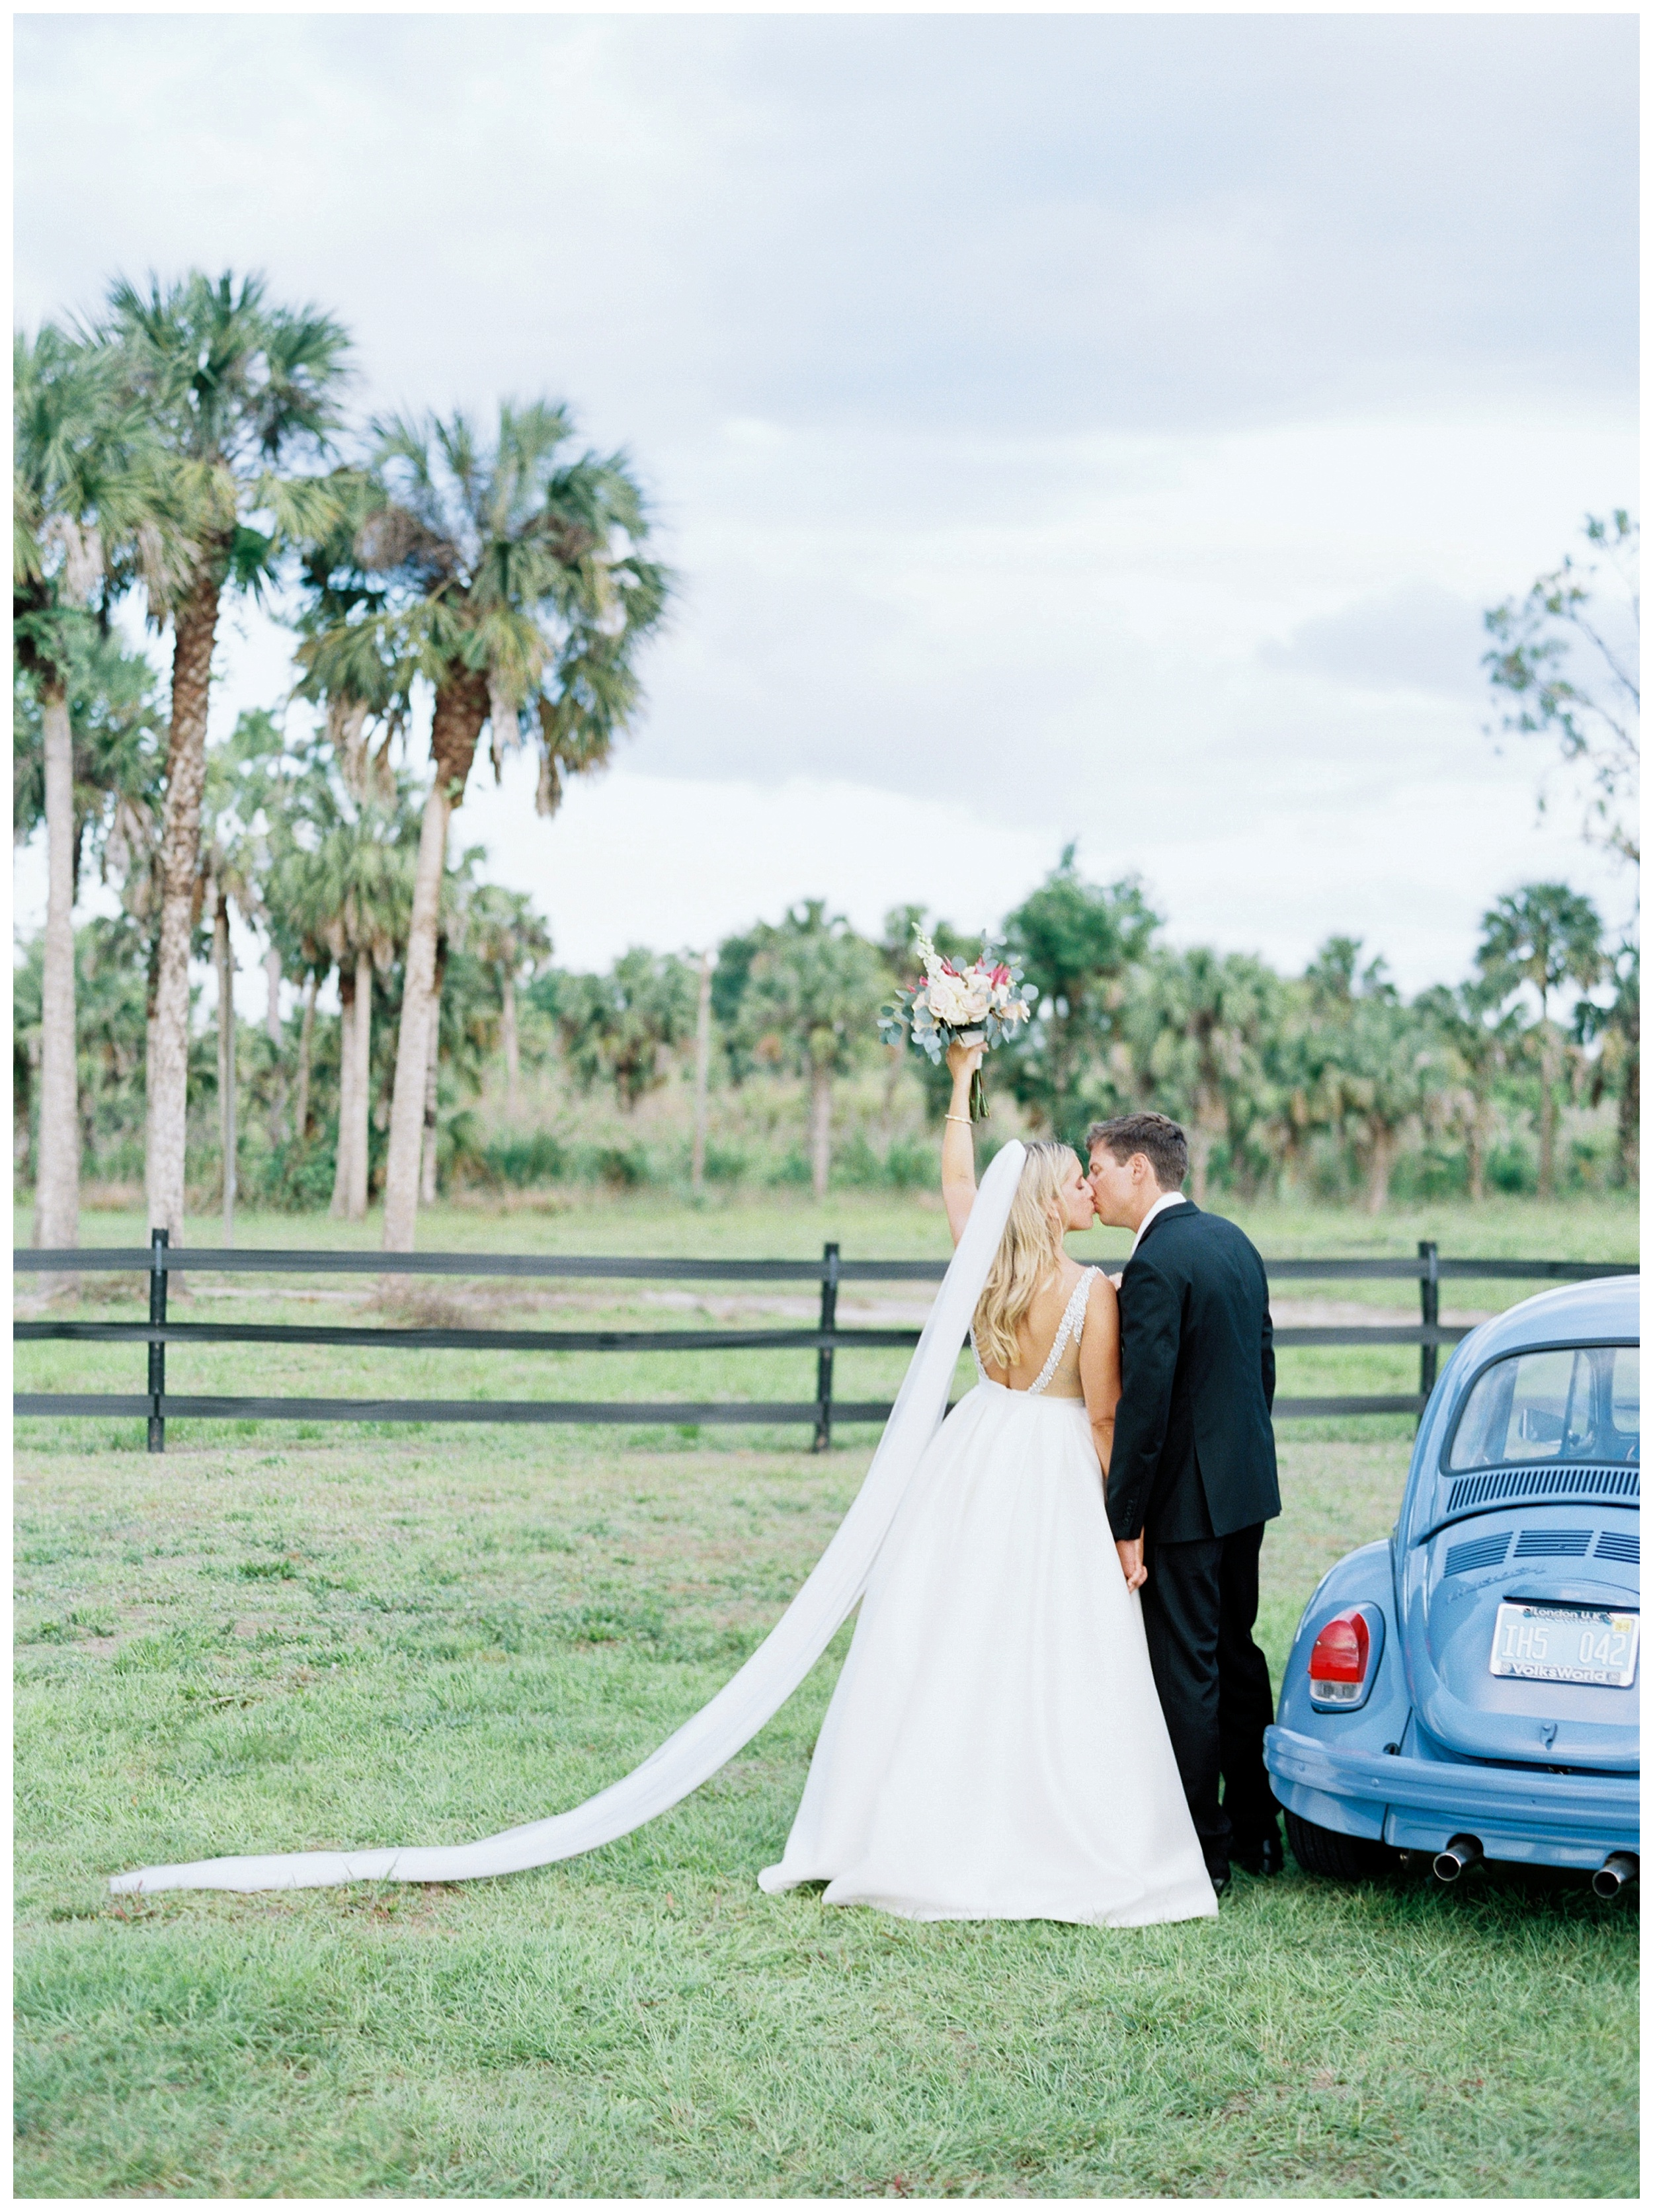 South Florida Wedding Photographer Kir Tuben_0001.jpg